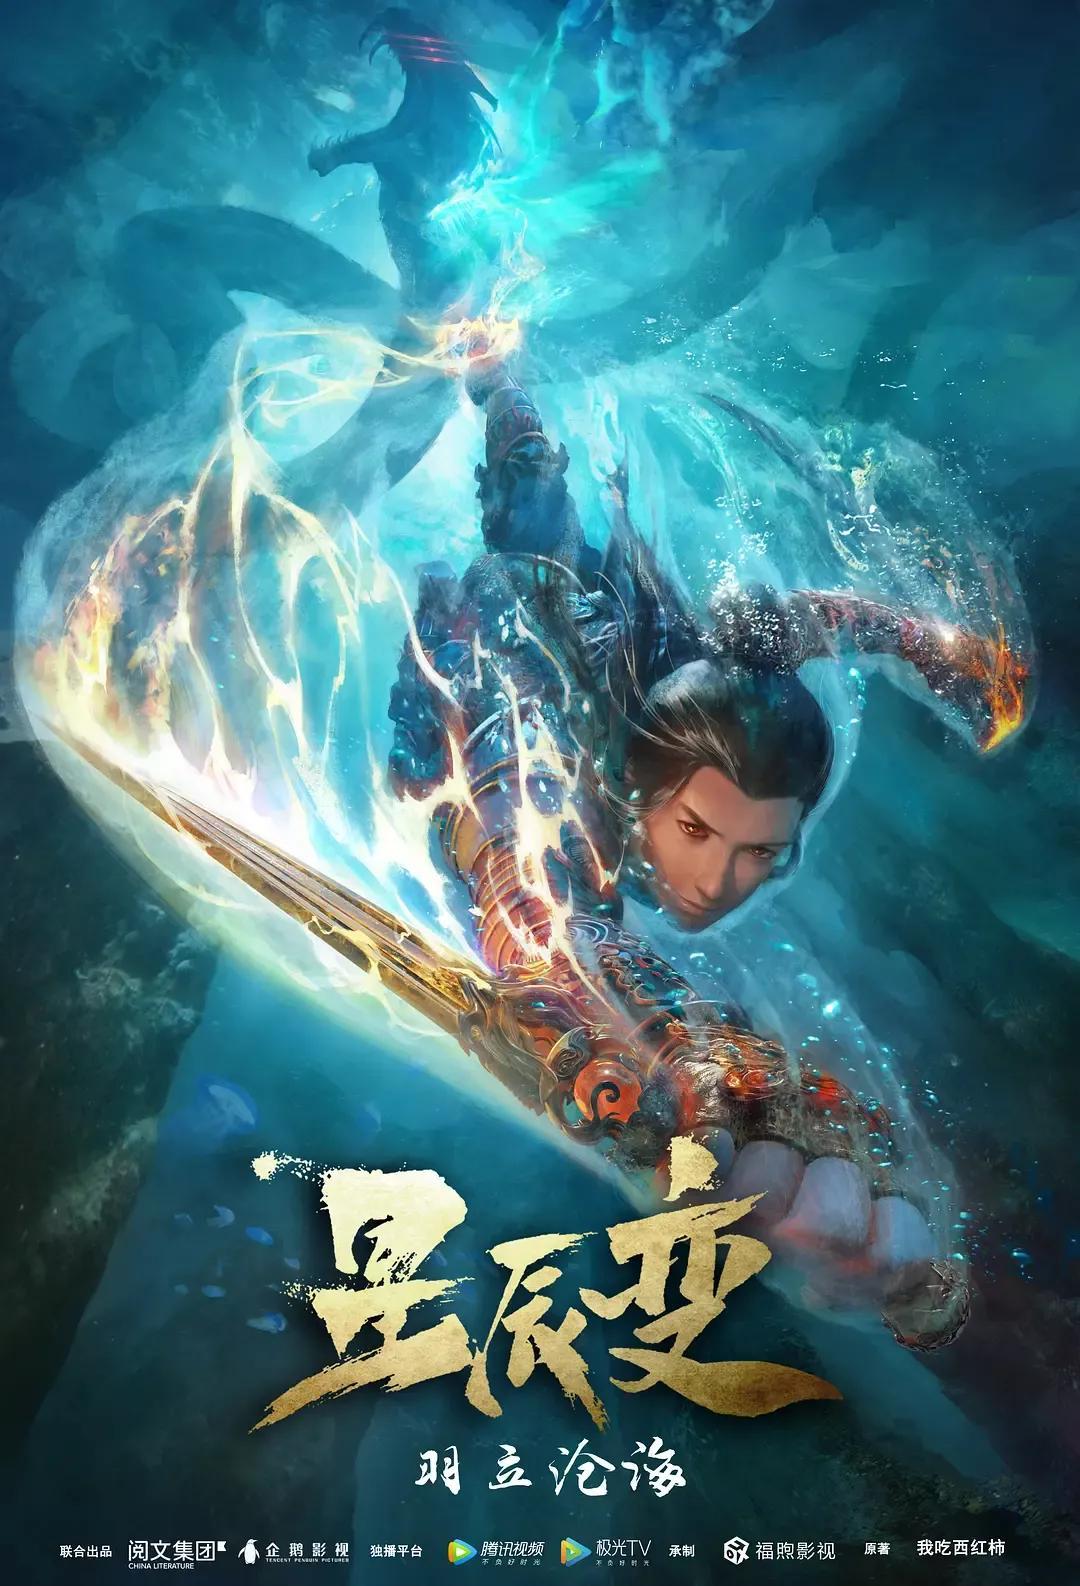 Xing Chen Bian 3 (Stellar Transformation Season 3) การผันแปรของดวงดาว (ภาค3) ซับไทย